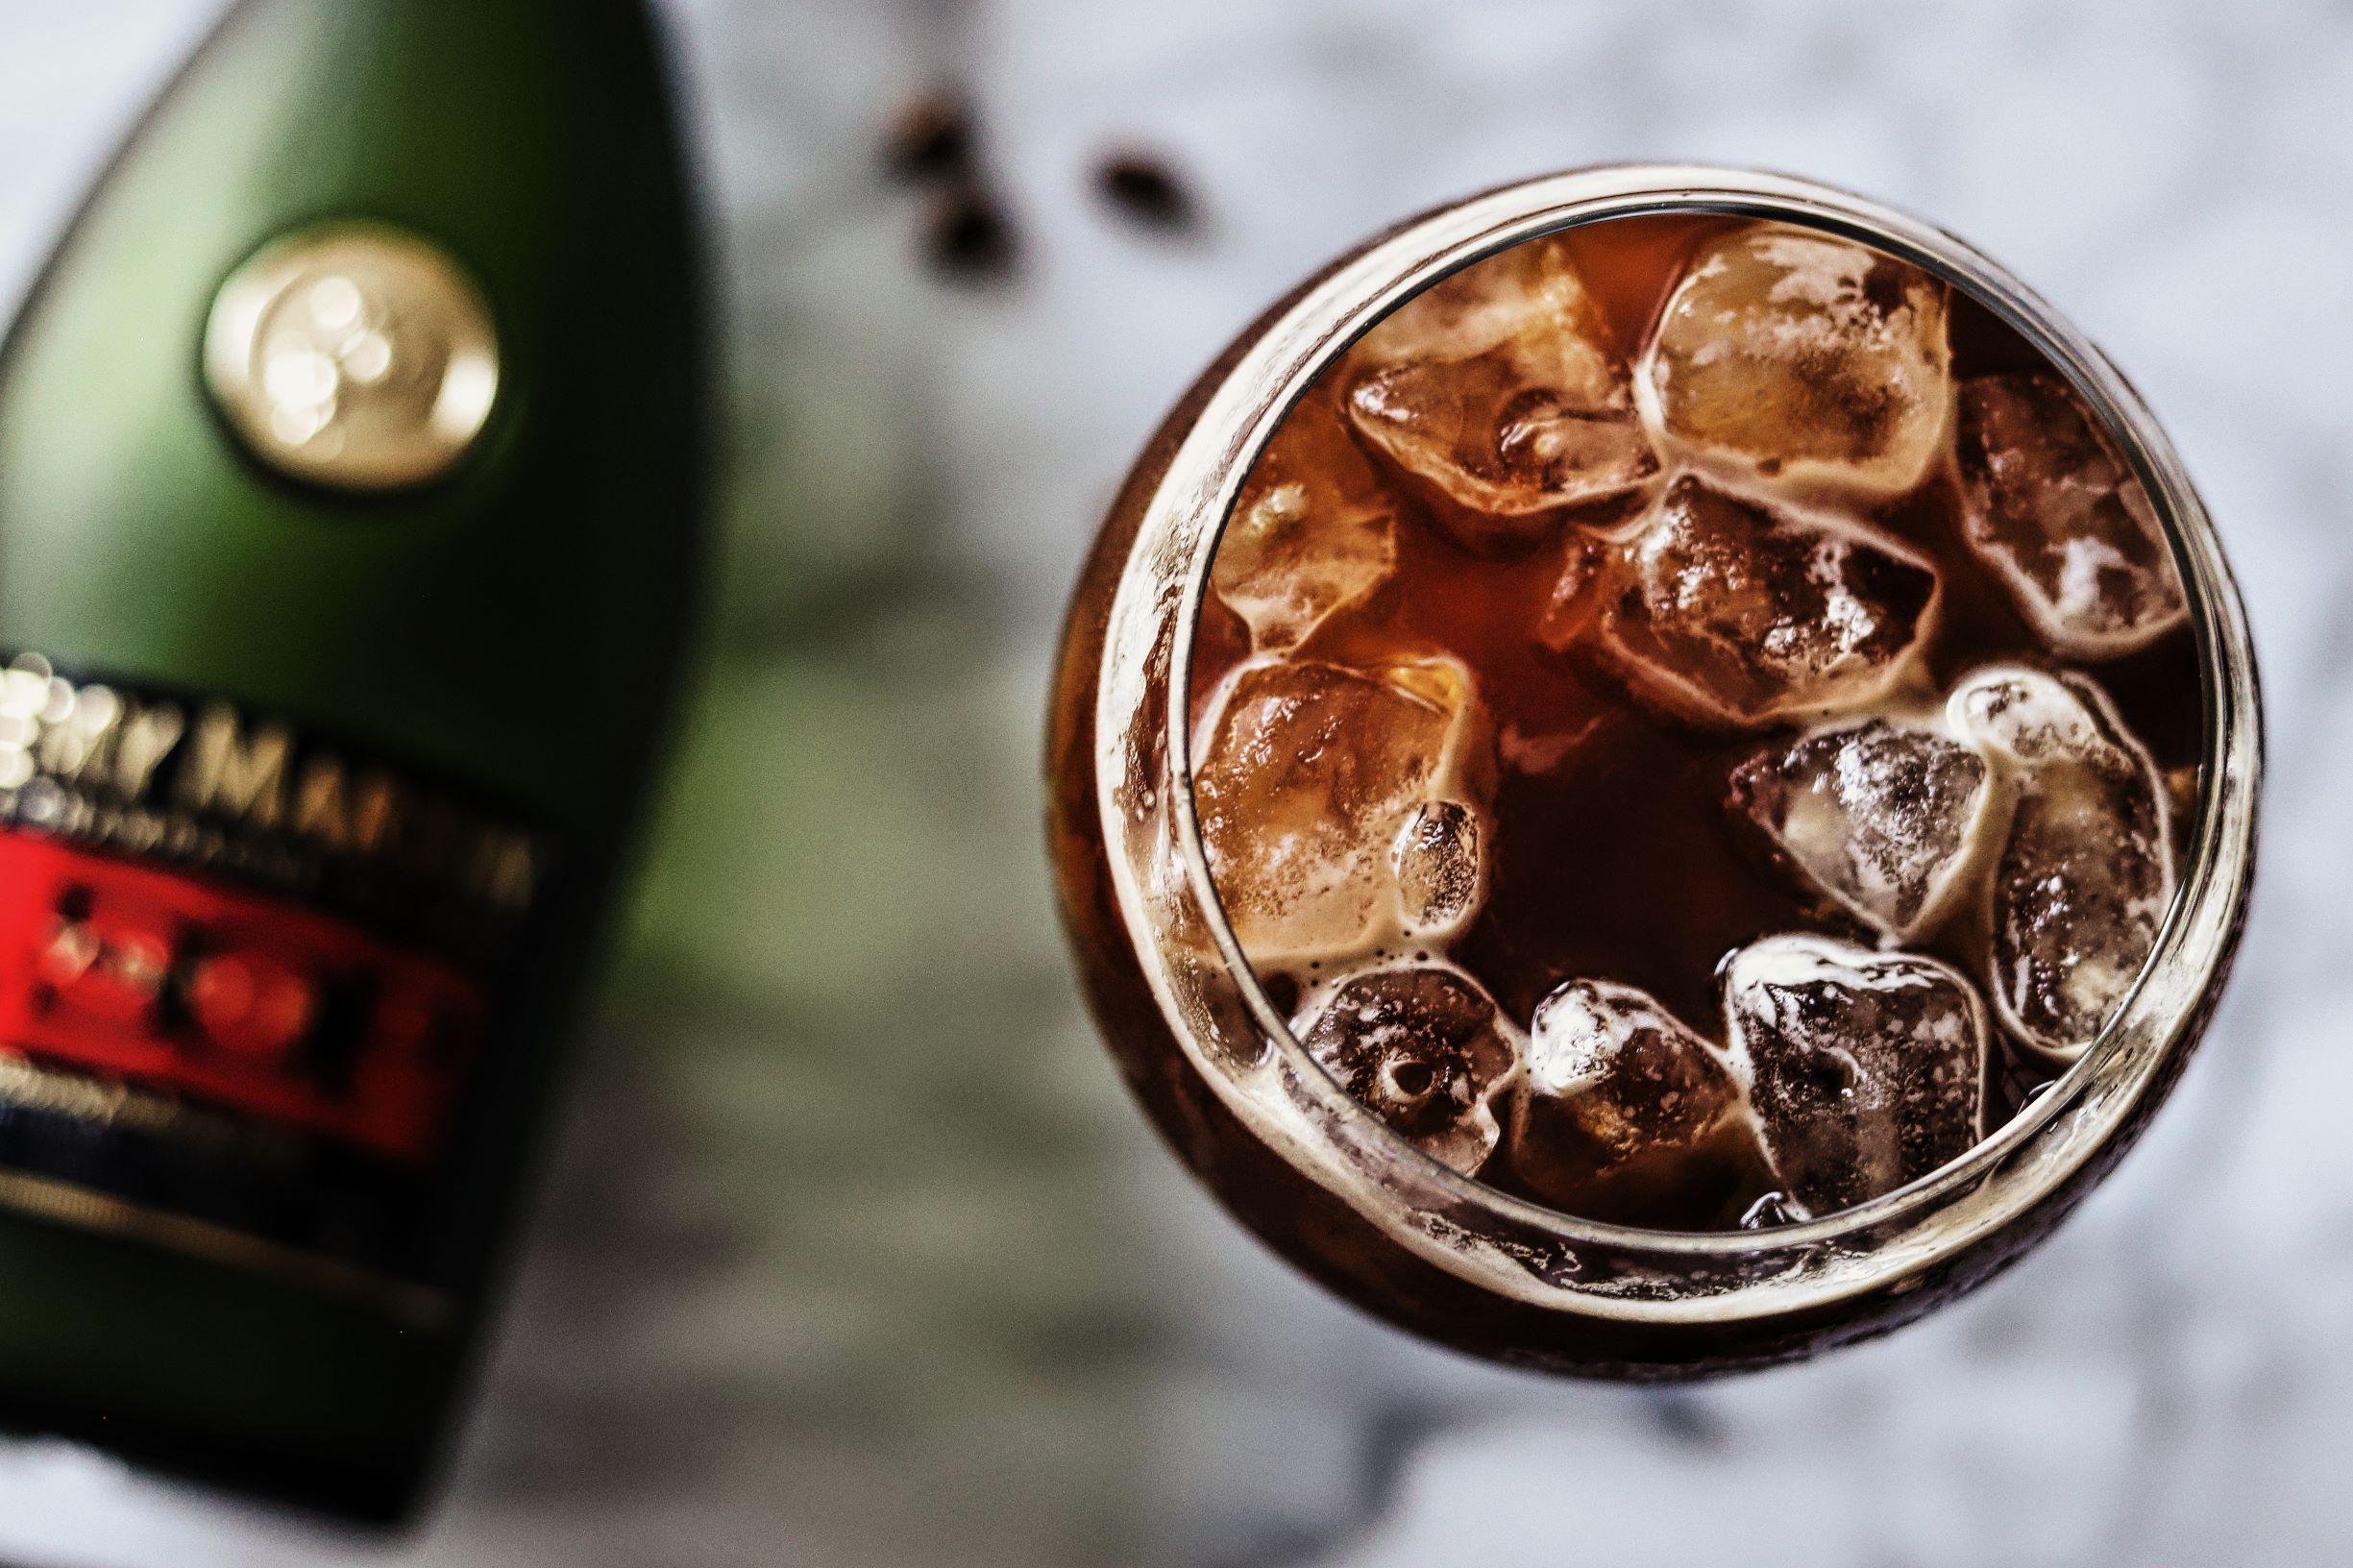 LeClair Organics coffee roaster, liberica coffee, Iced cognac coffee cocktai